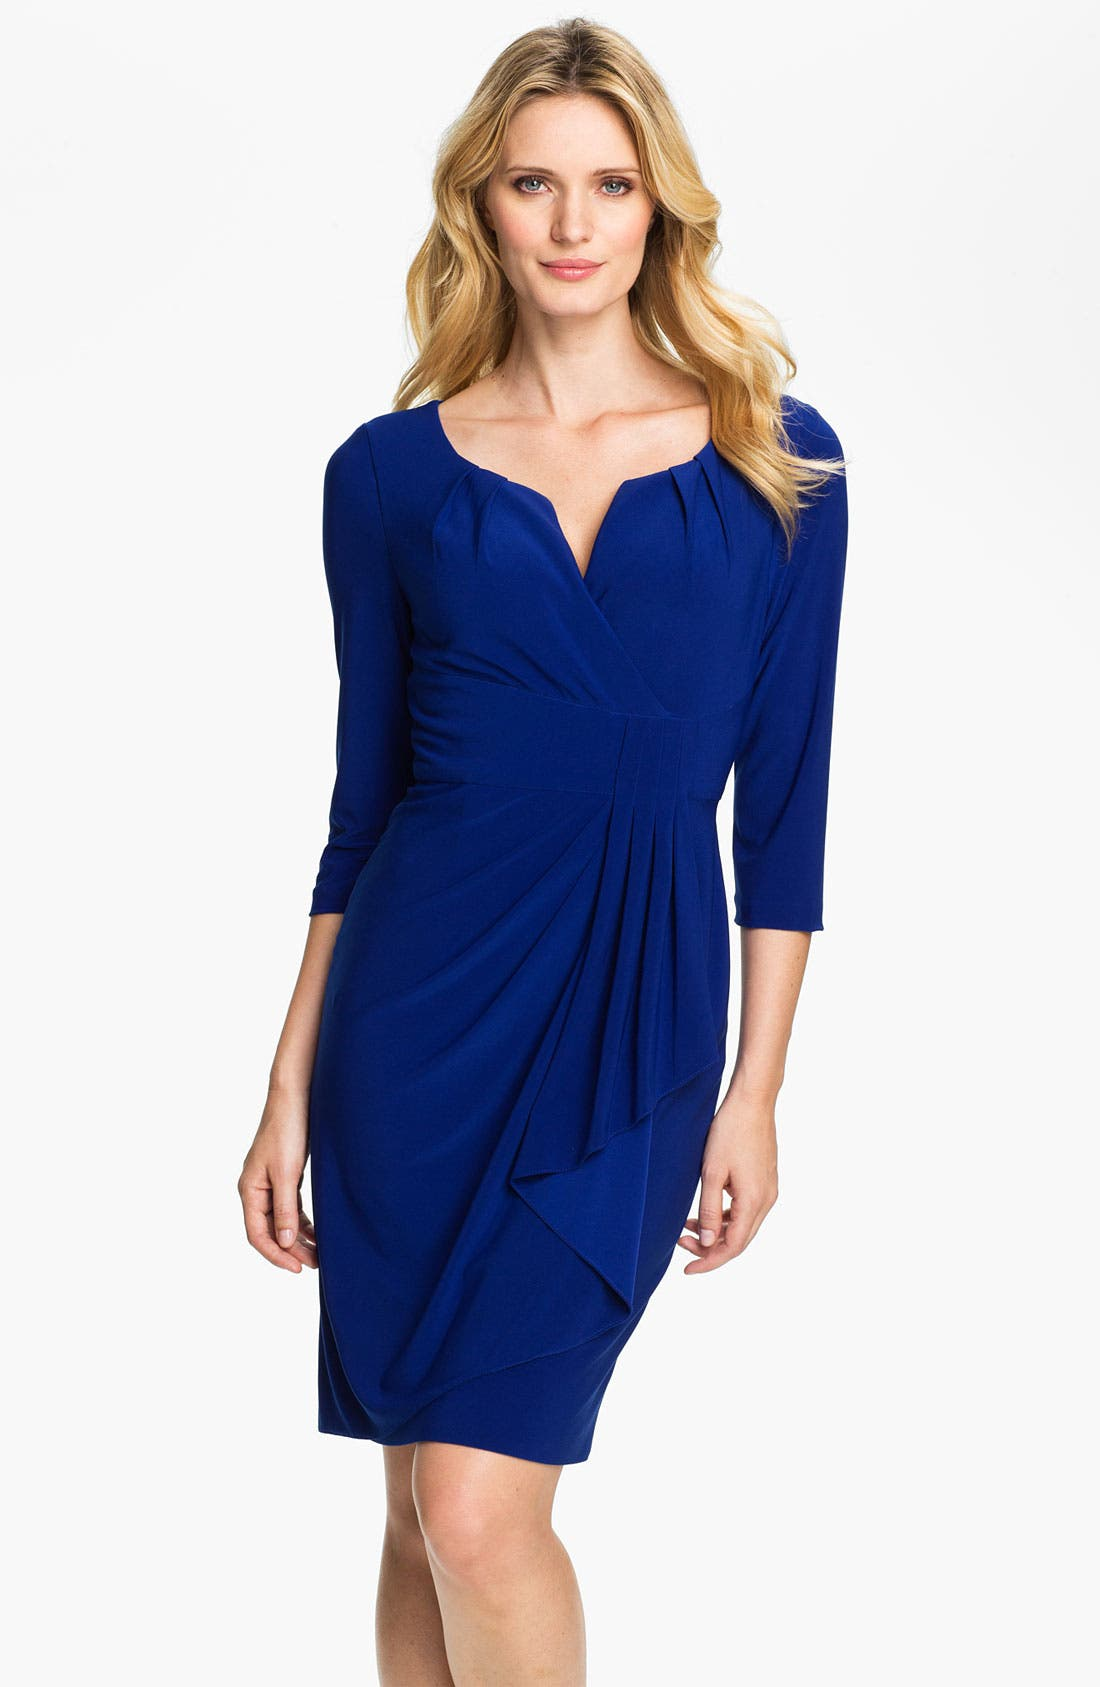 Alternate Image 1 Selected - Adrianna Papell Side Drape Surplice Dress (Petite)